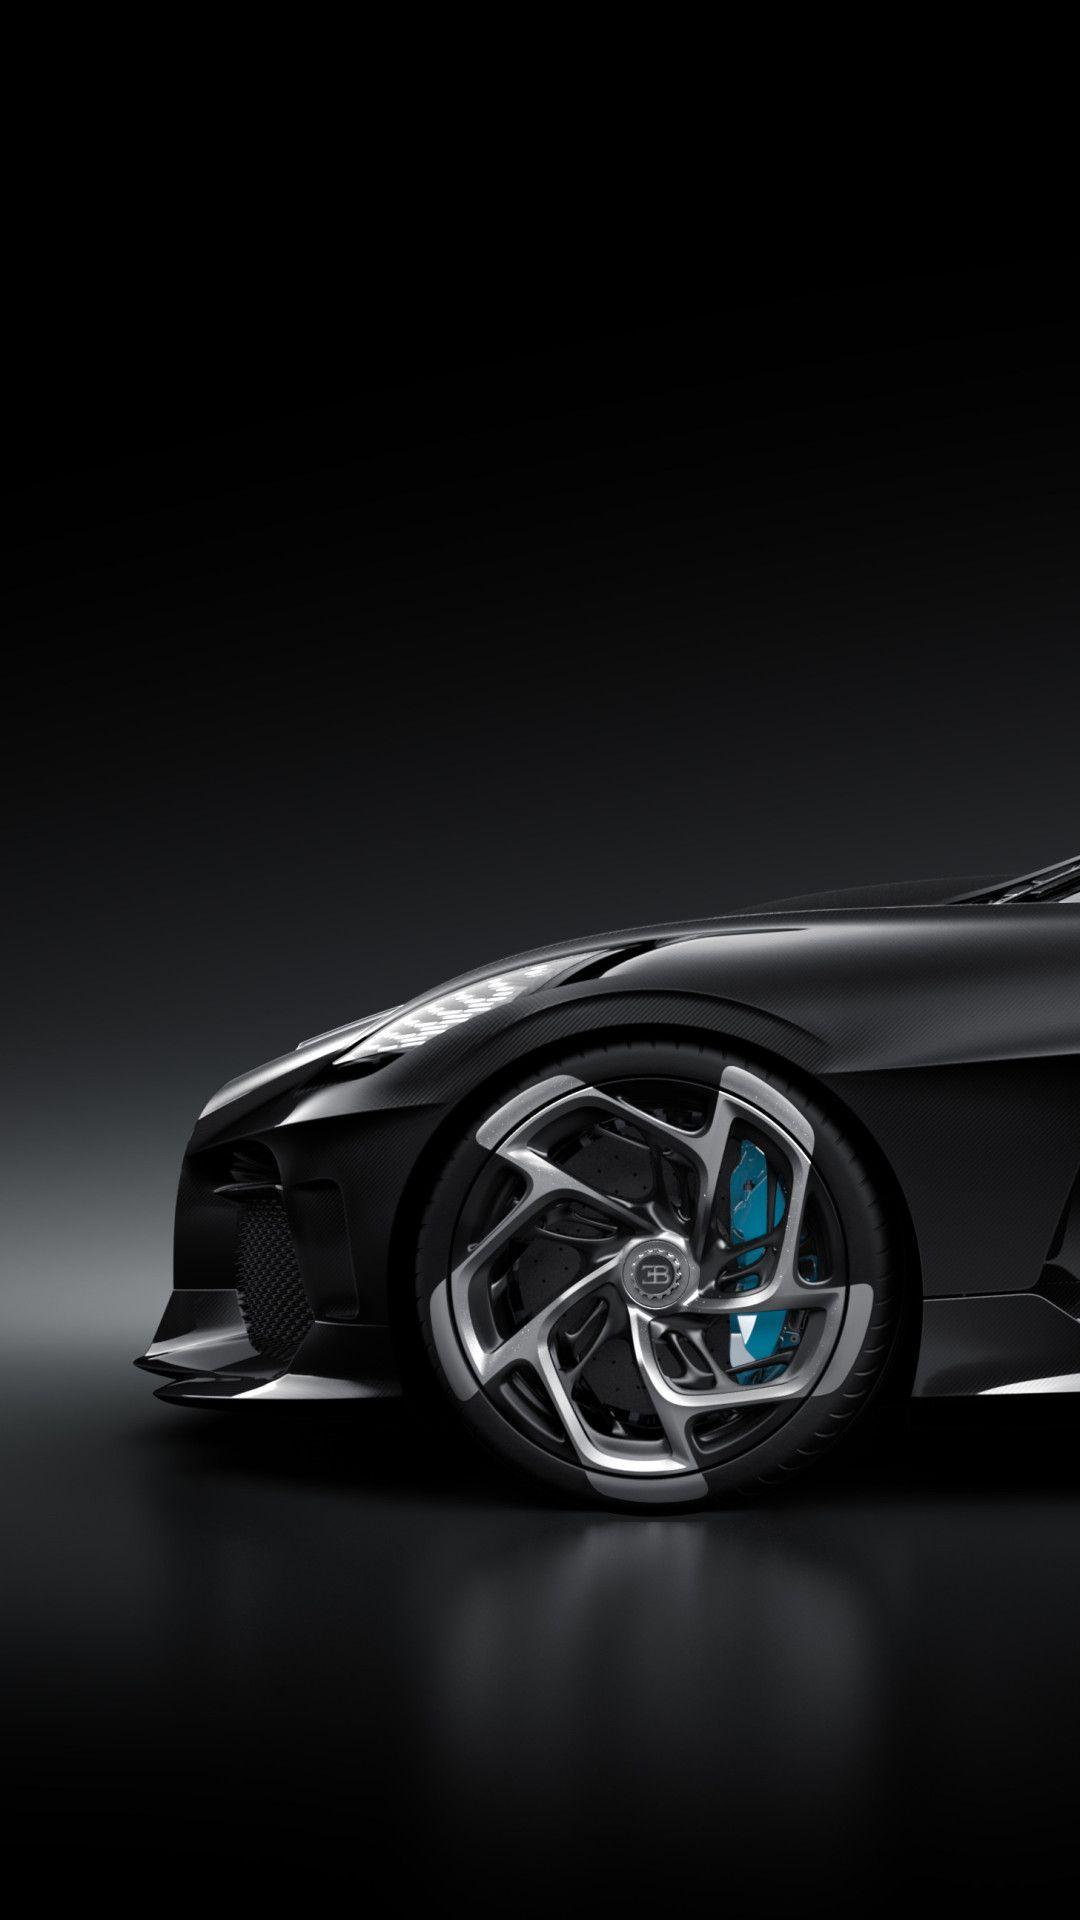 Bugatti La Voiture Noire Side View Mobile Wallpaper (iPhone, Android, Samsung, Pixel, Xiaomi) in ...